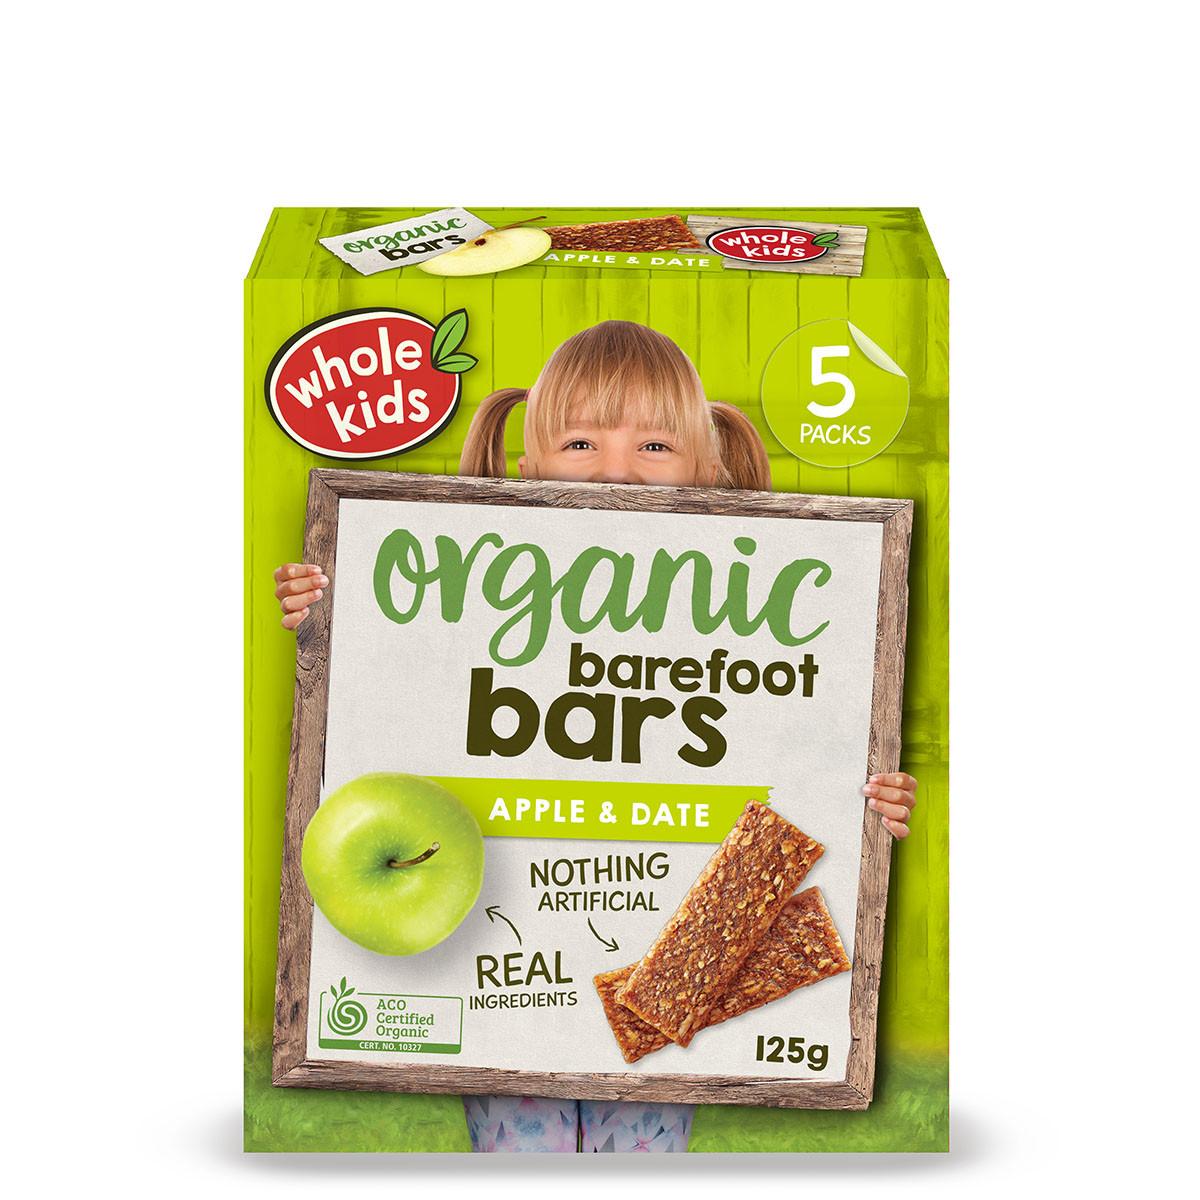 Healthy Natural Snacks  Whole Kids Organic Barefoot Bar